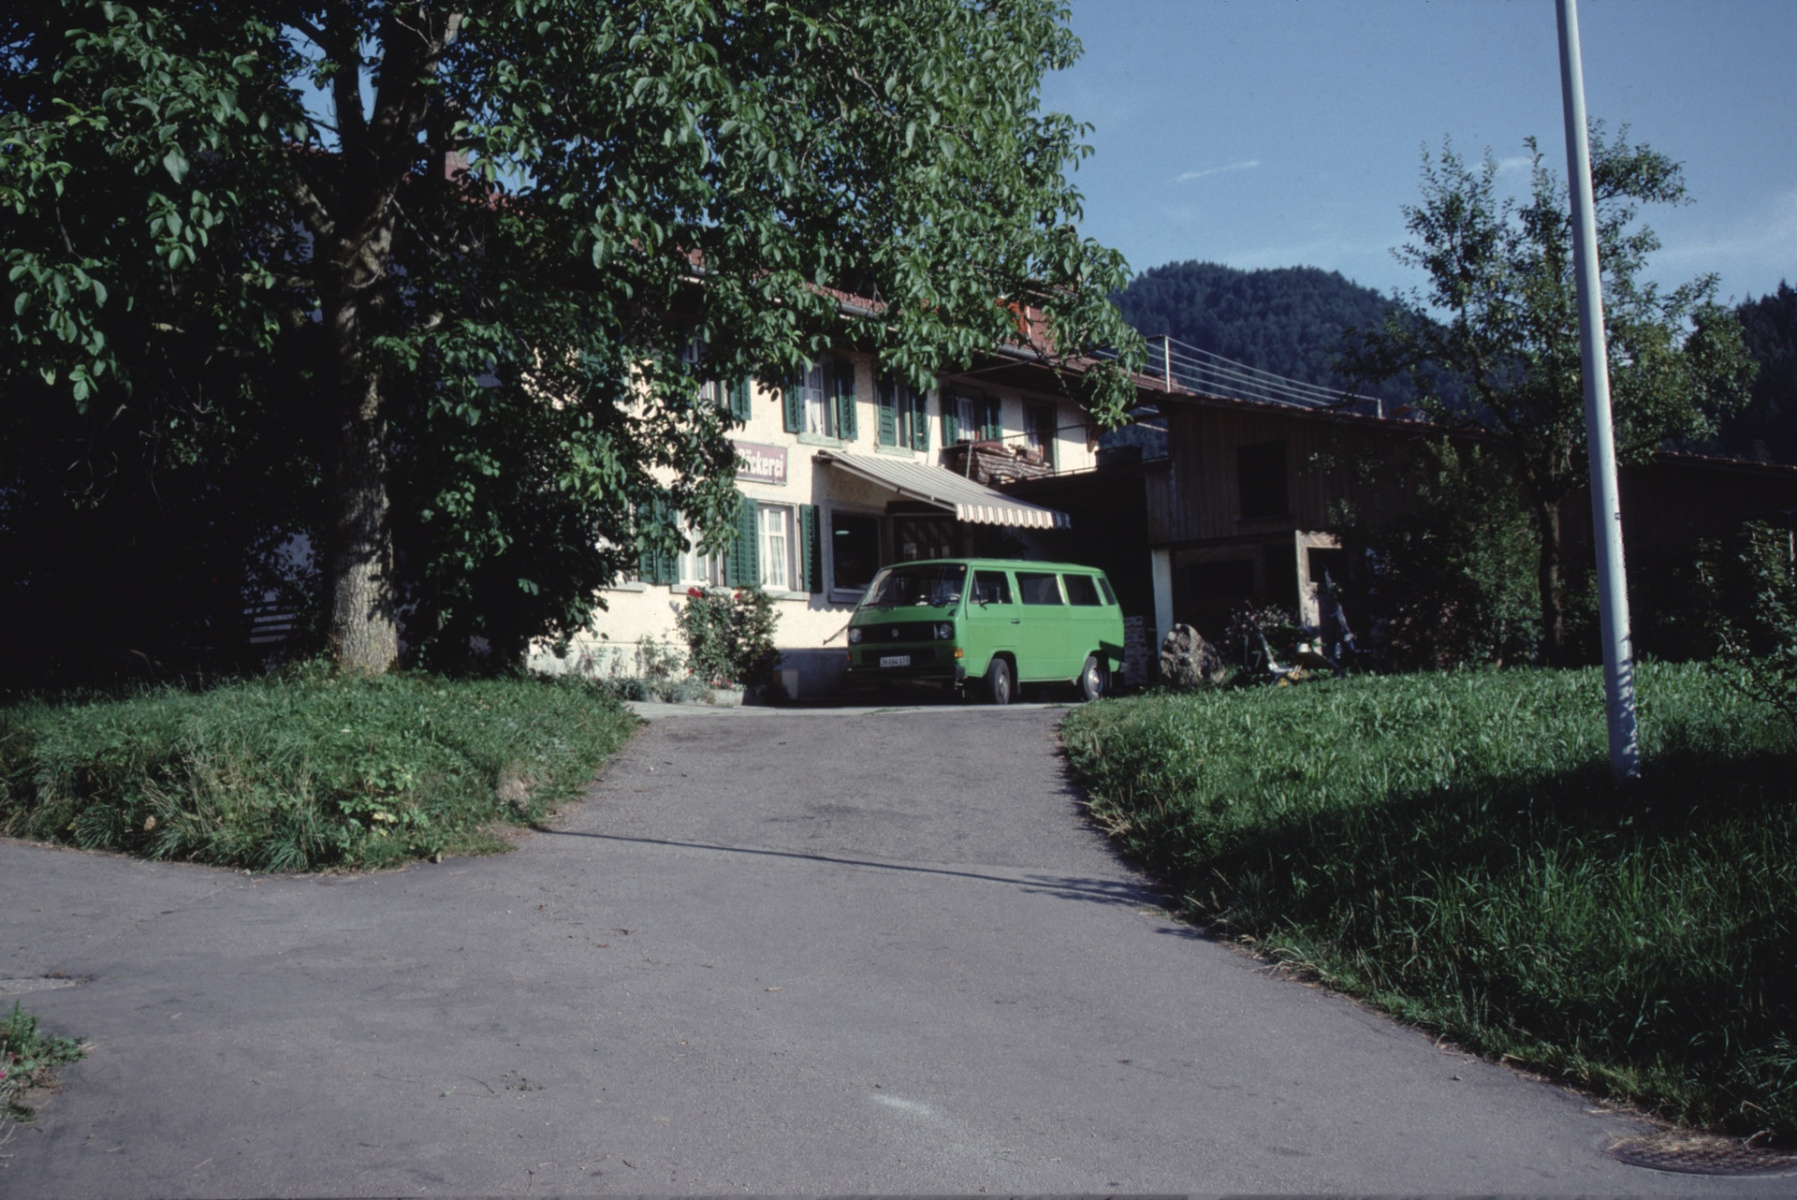 Bäckerei Th. Meier